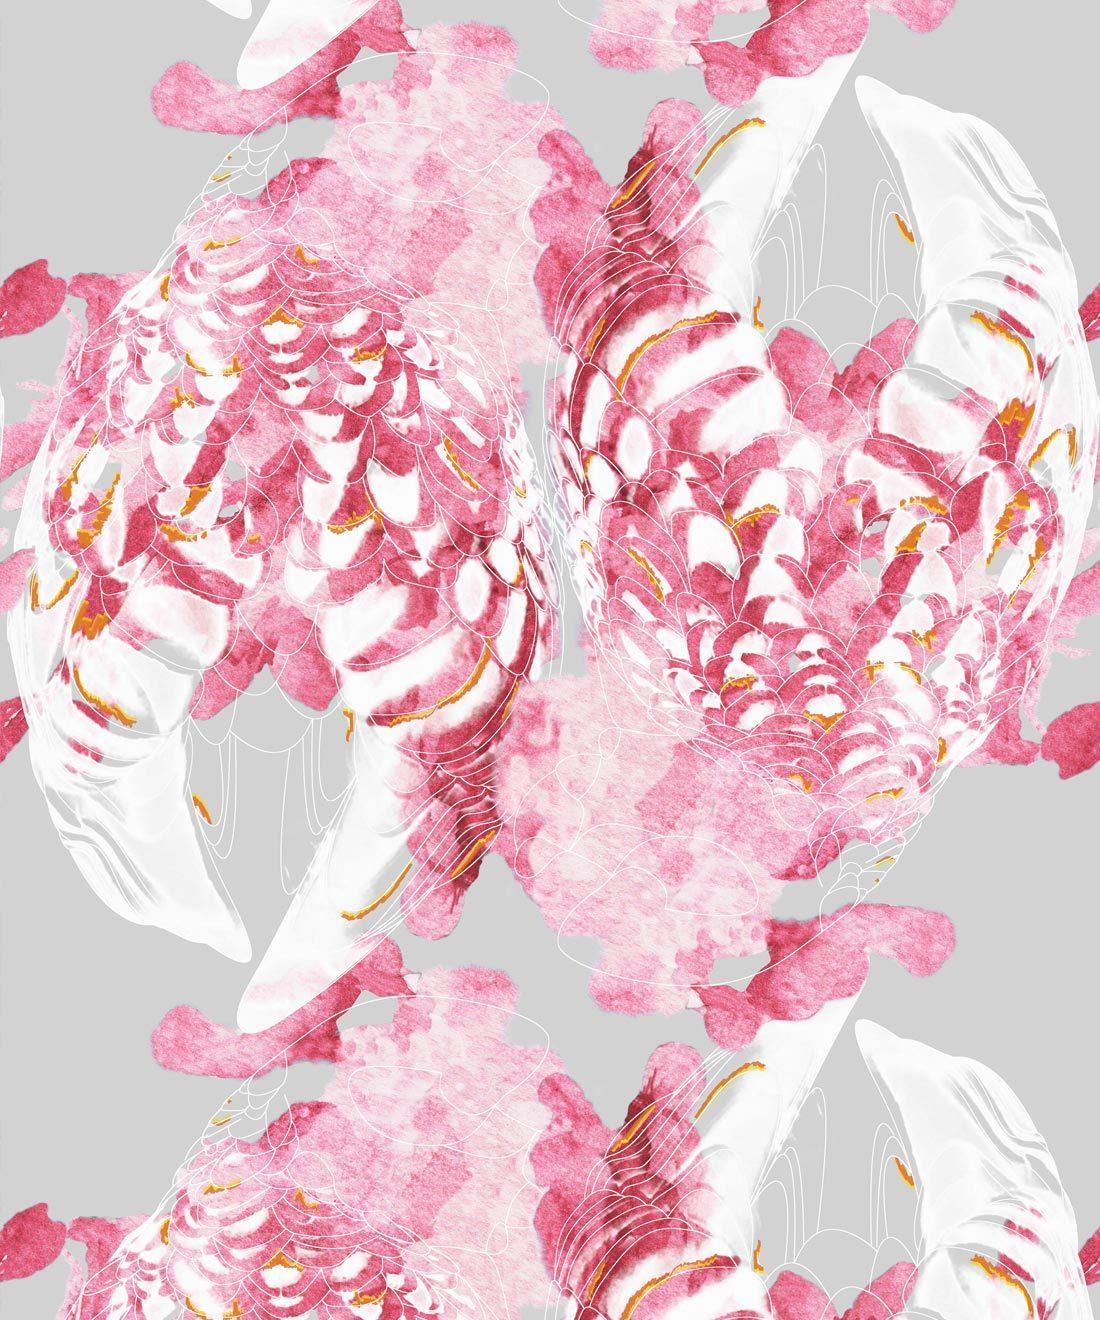 Kandos Mulberry Wallpaper